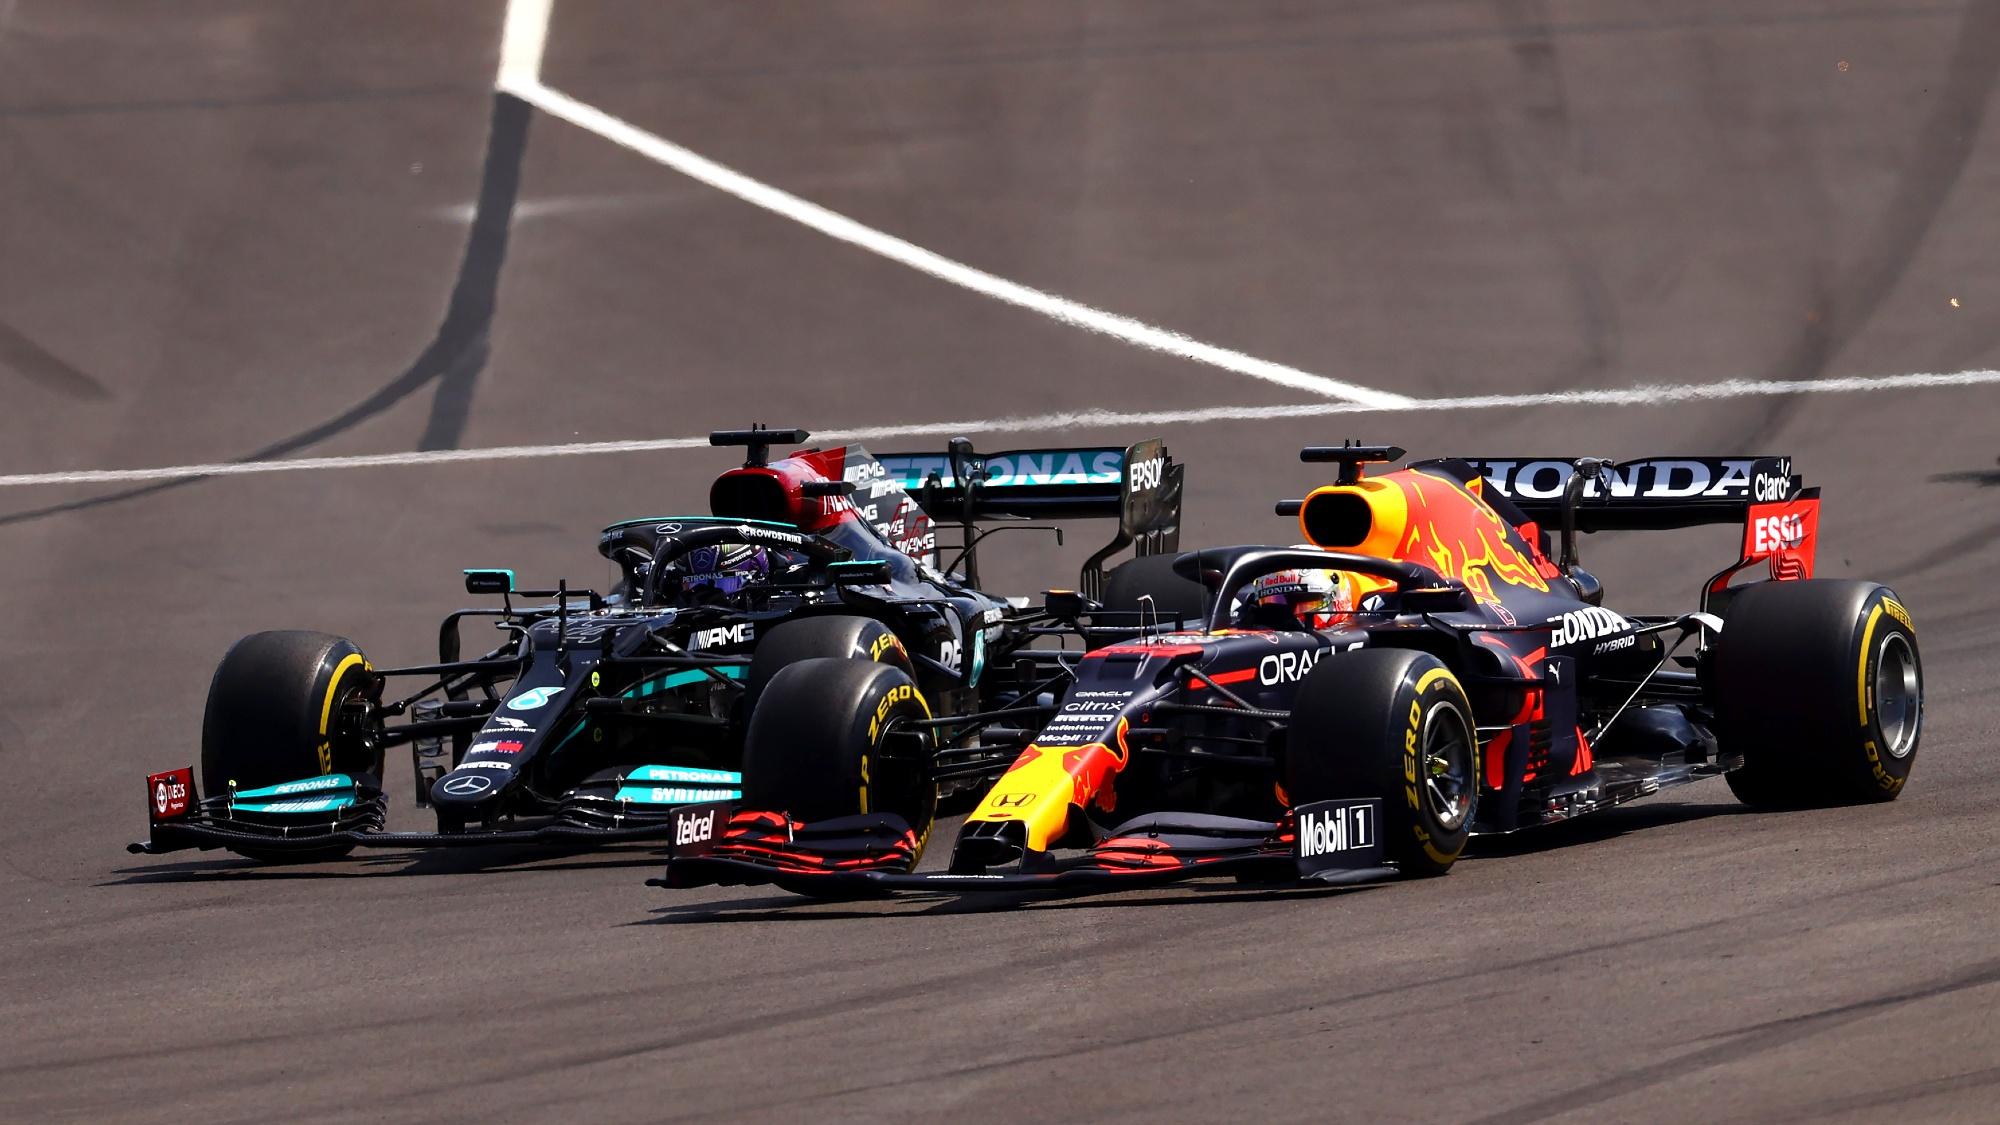 Max Verstappen, 2021 Portuguese GP